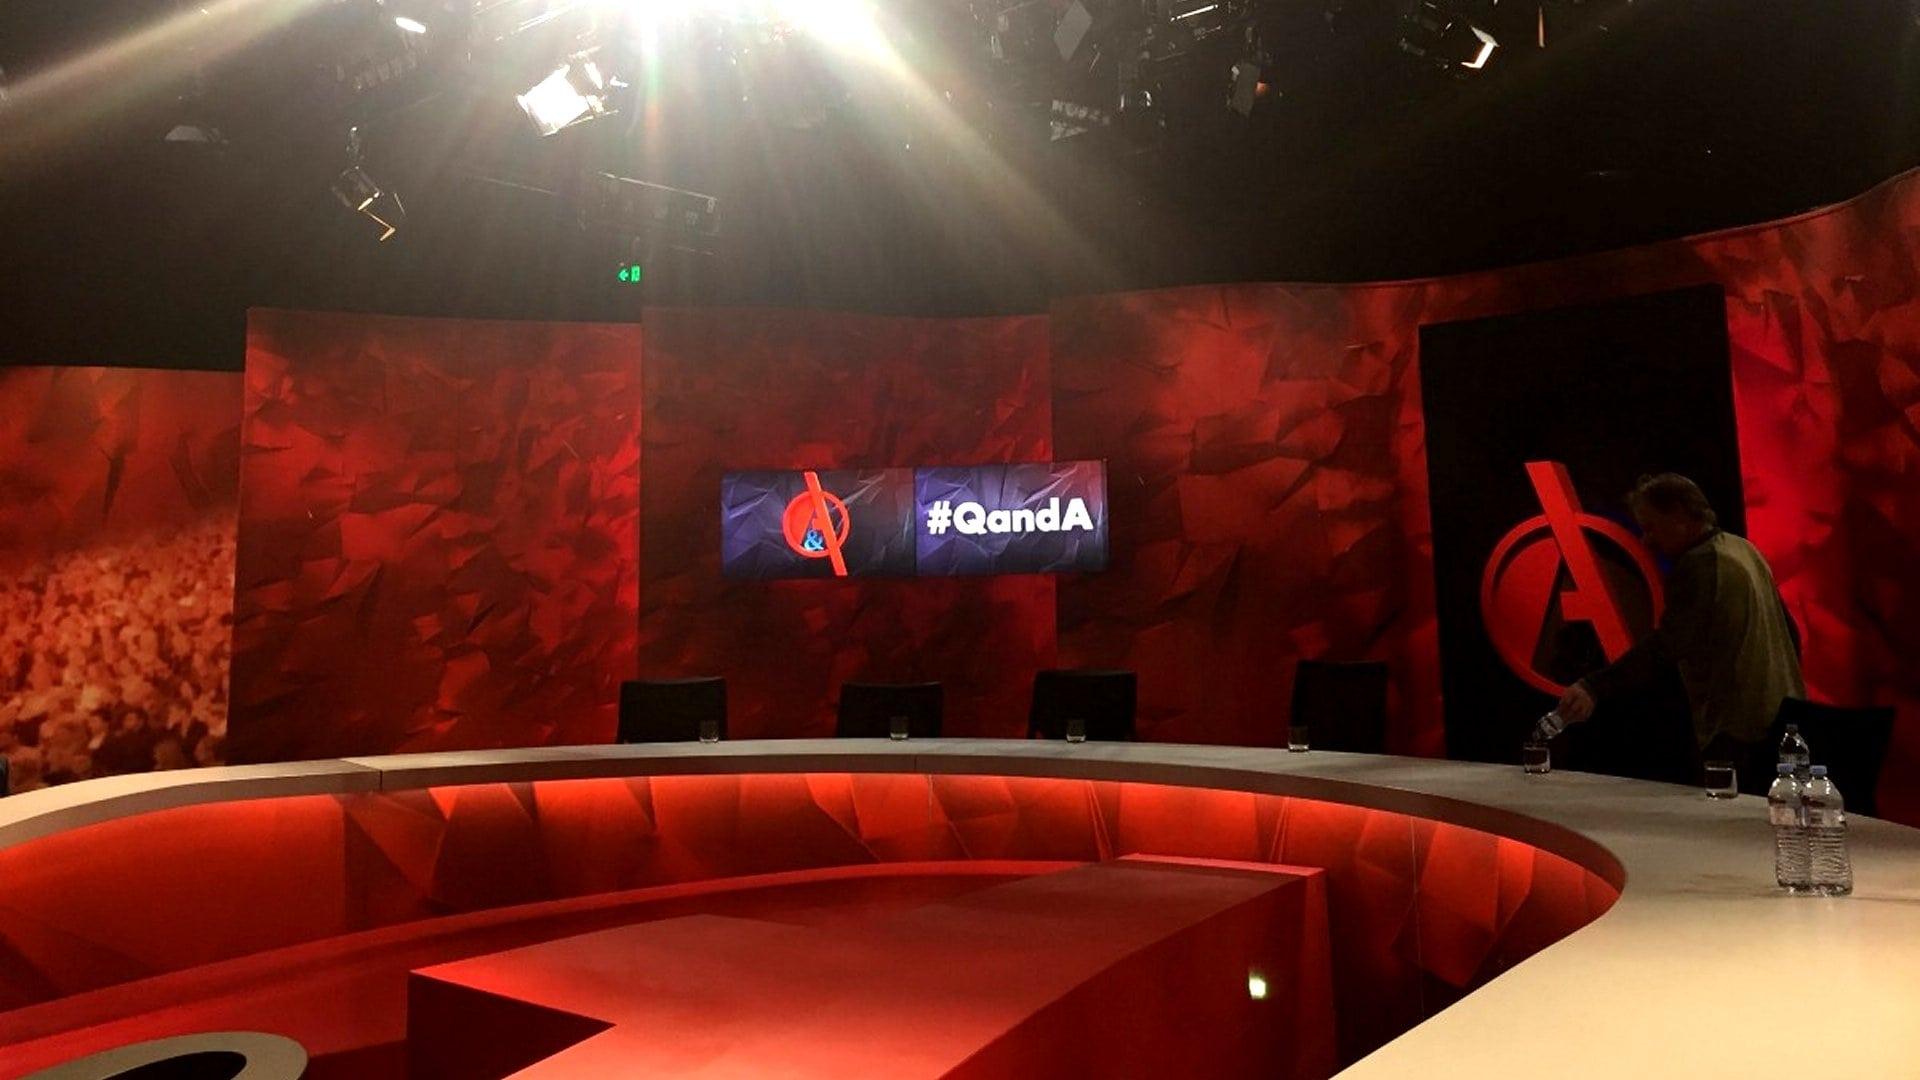 Q&A - Season 5 Episode 3 : The Labor Leadership